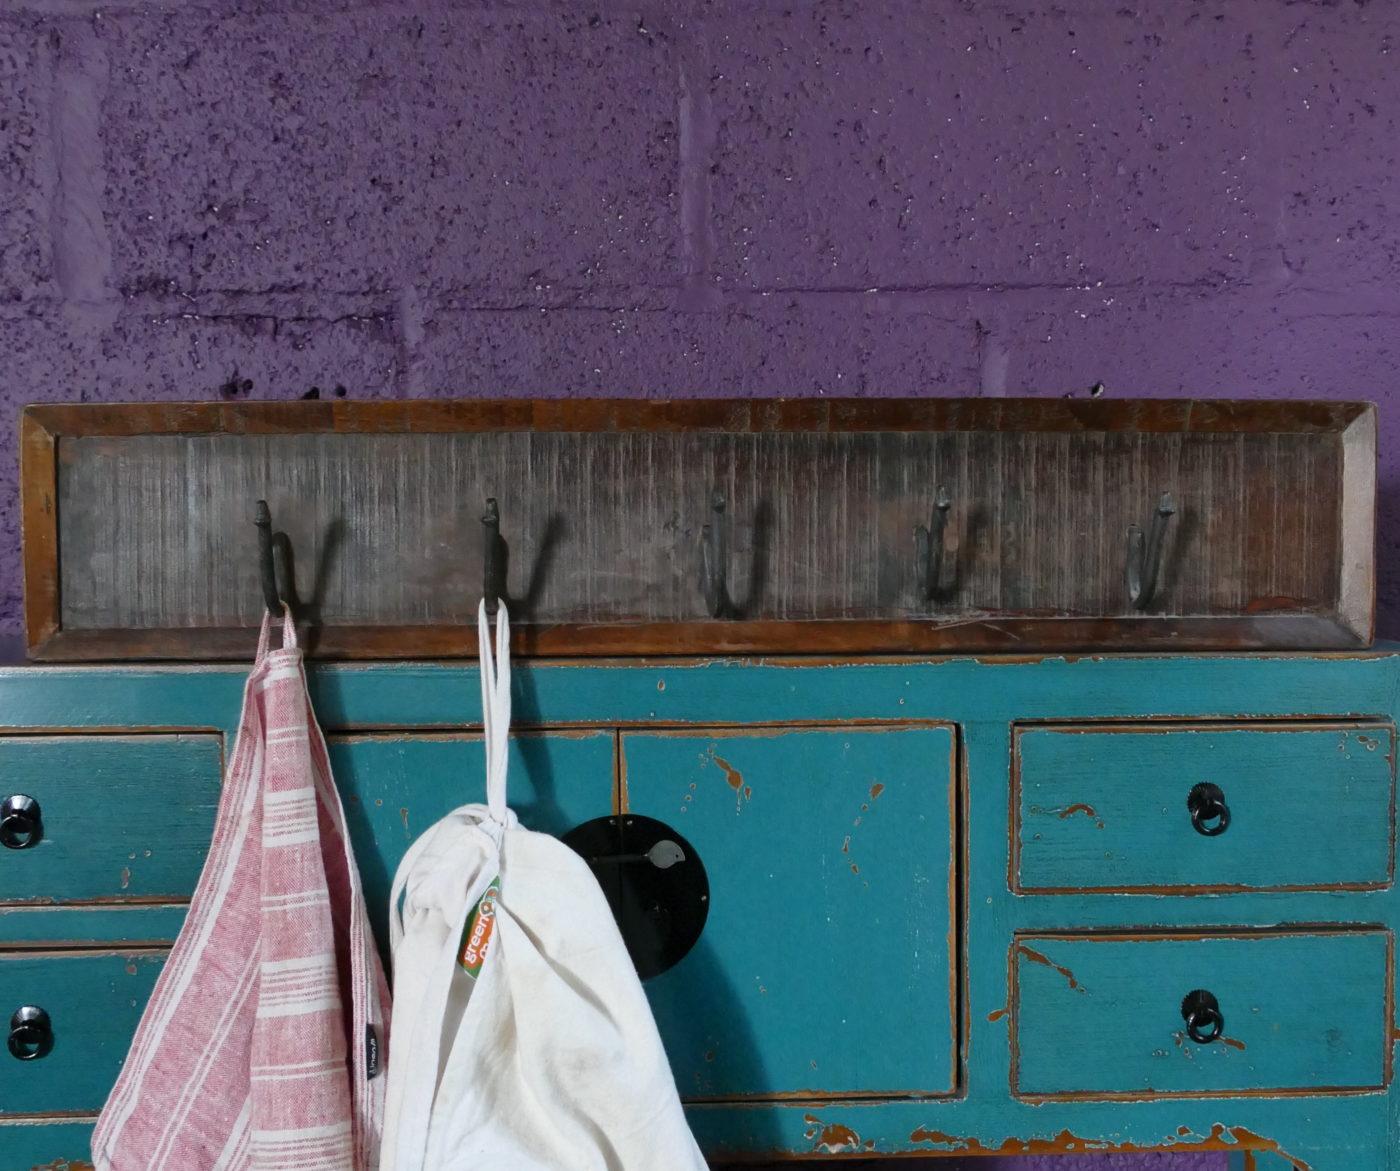 Five Hook Coat Hanger with aprons